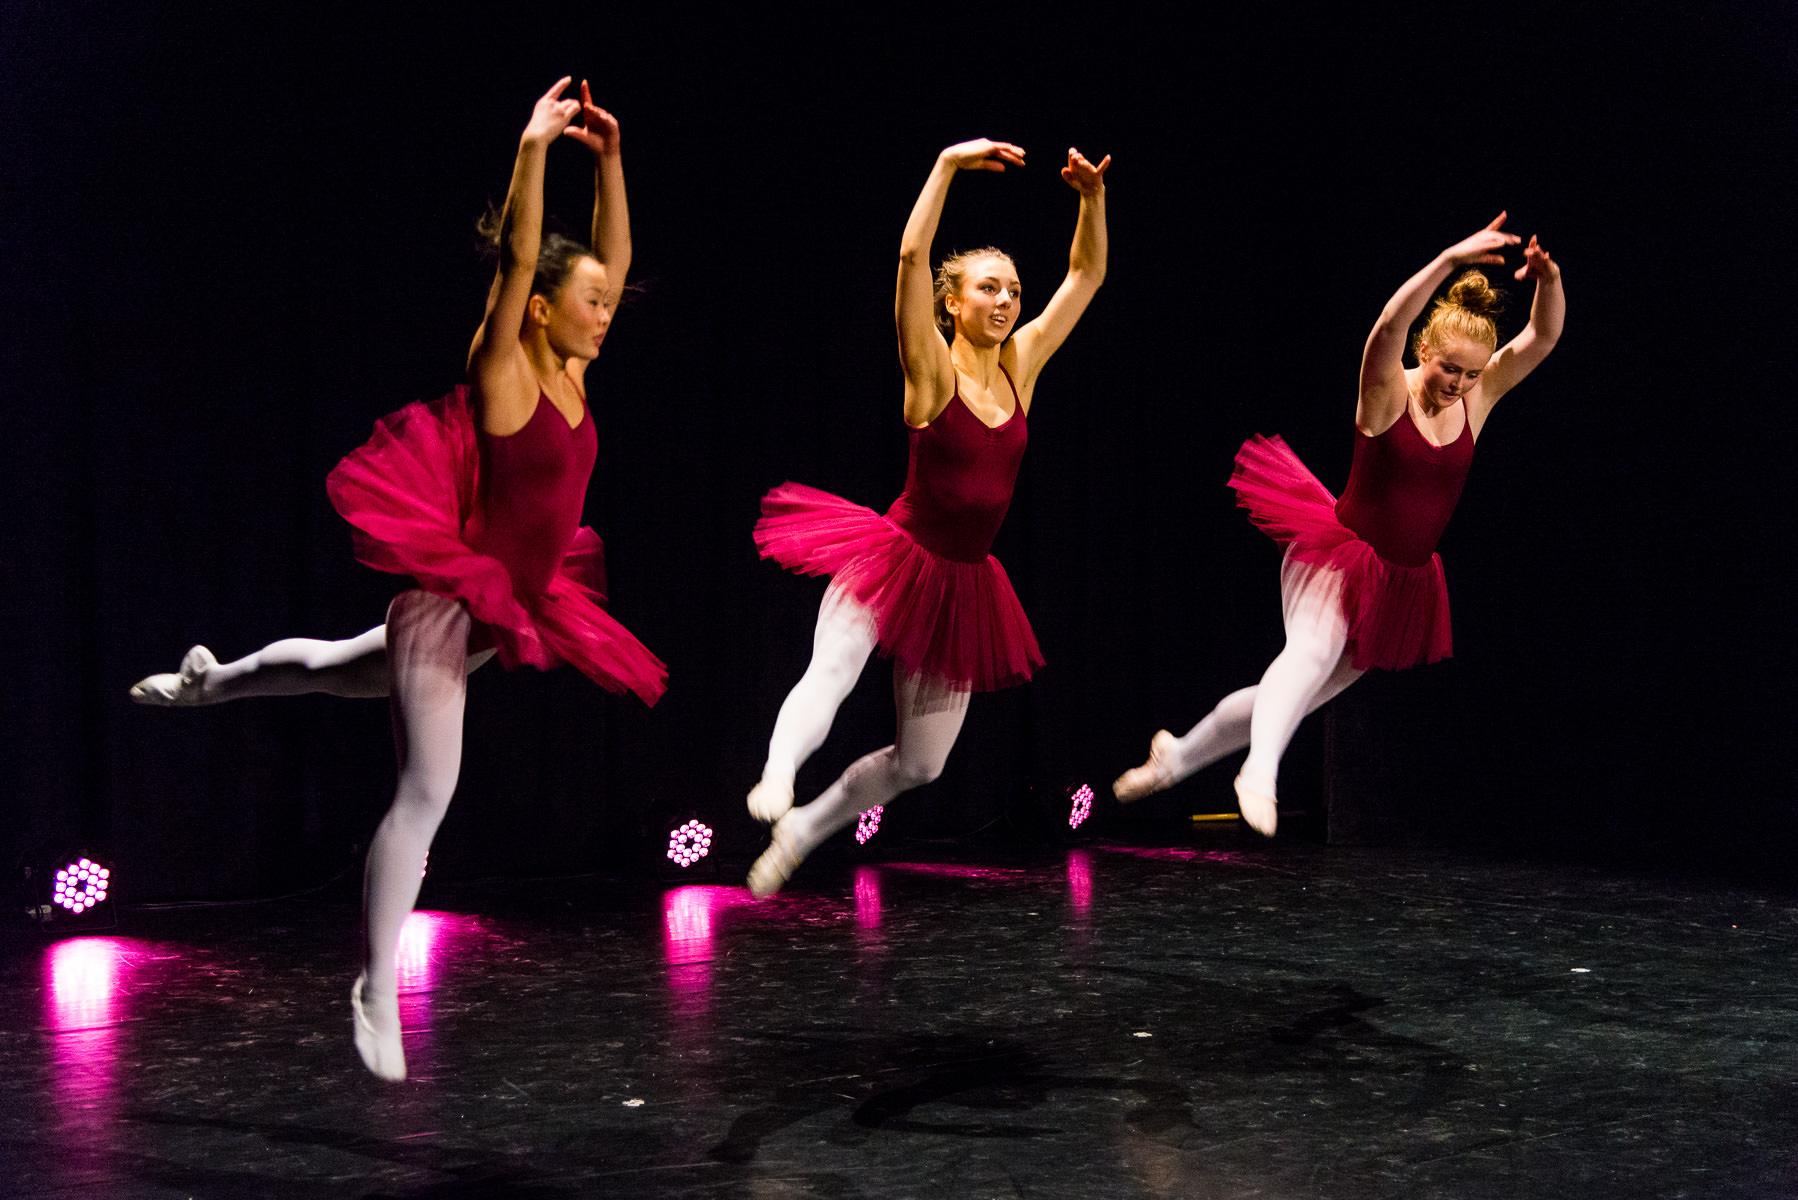 Le corsaire - Koreograf: Marius Petipa, innstudering: Julie Holth - Dansere: 3MDD - Jubileumsforestilling Vinstra VGS danselinje - Foto Tor Ivan Boine